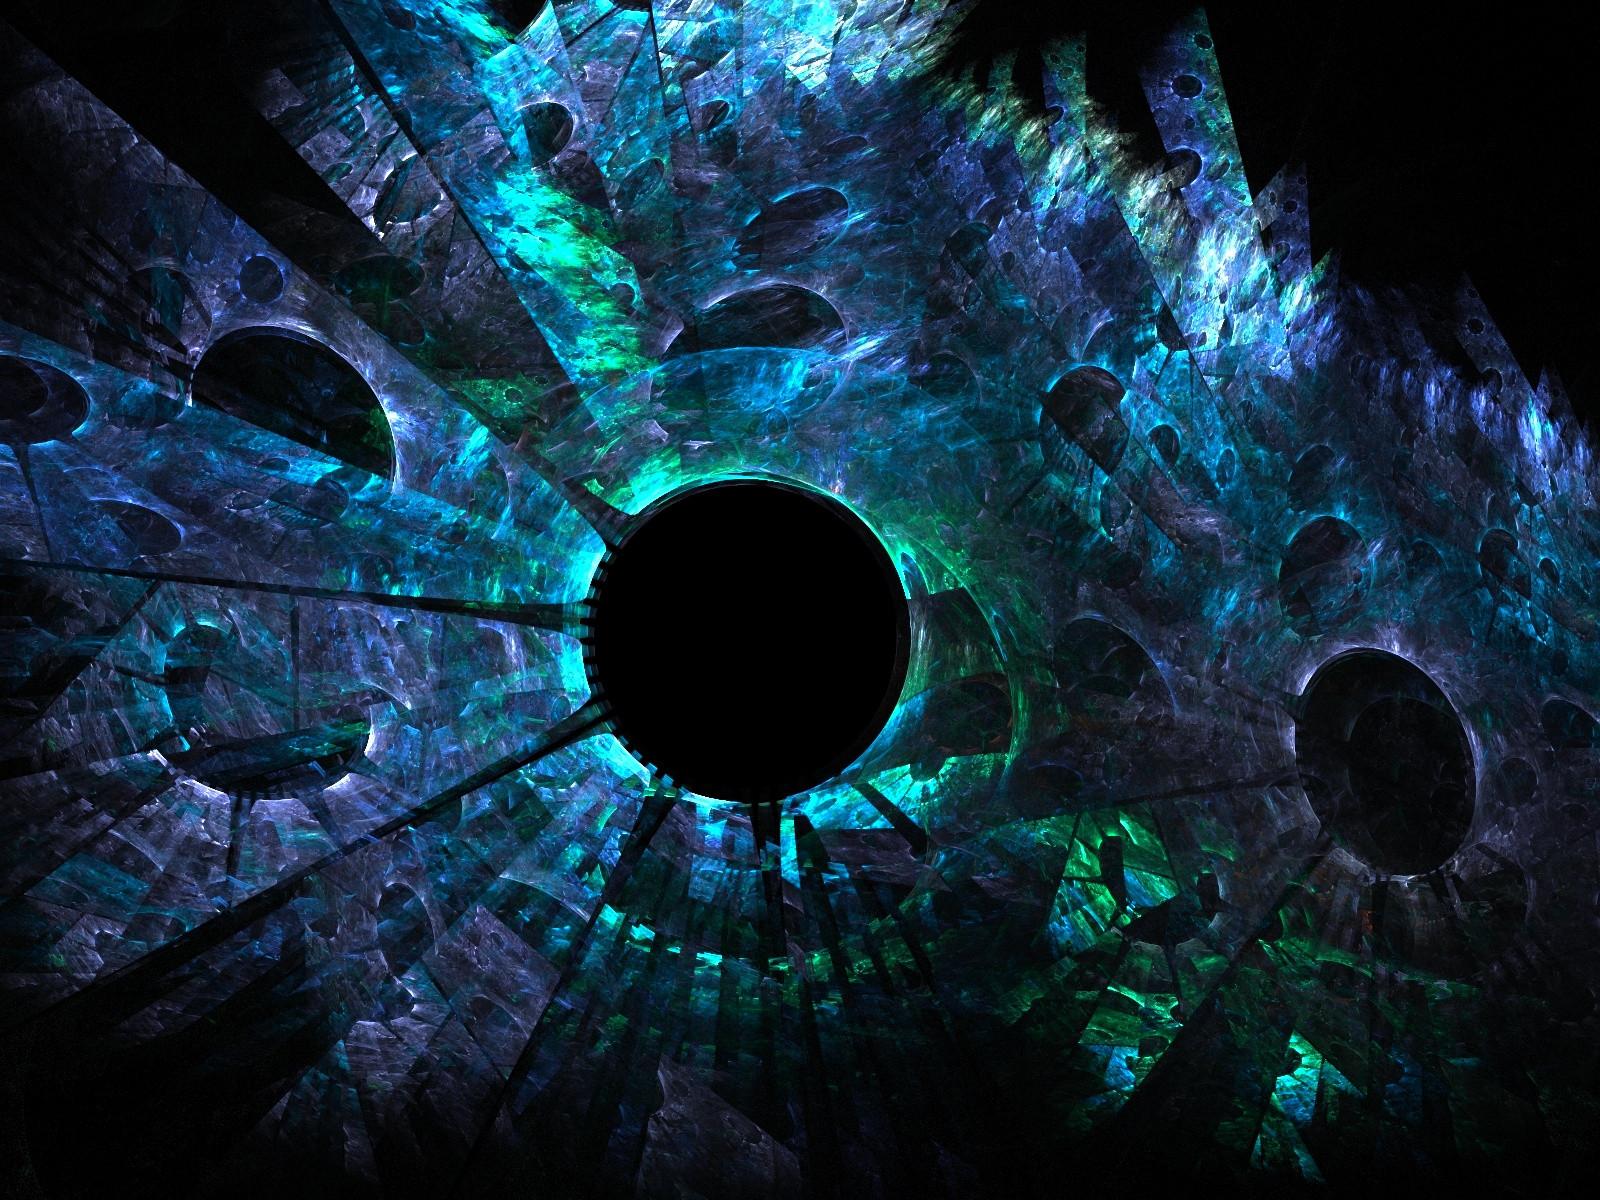 Black Hole Wallpaper for Windows - WallpaperSafari